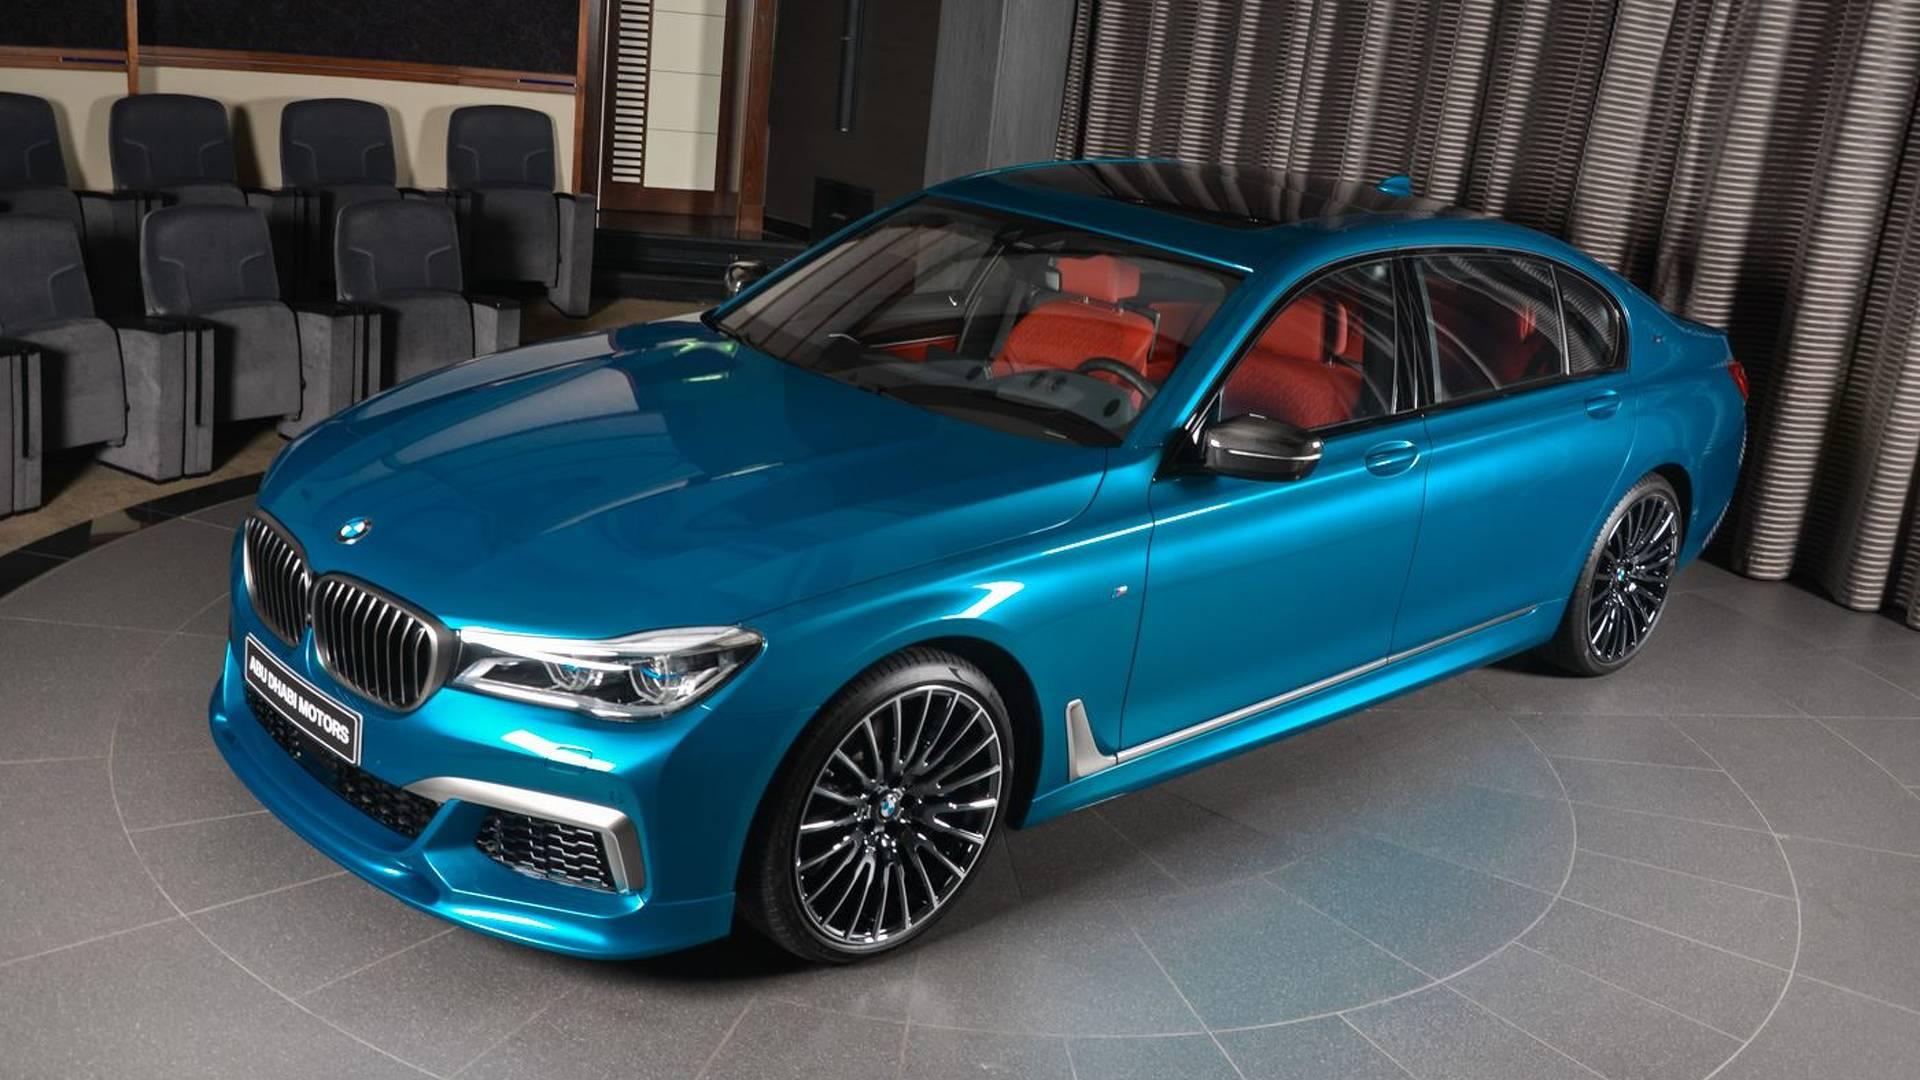 Bmw Long Beach >> M760li Individual Long Beach Blue Is Bmw Abu Dhabi S Latest Toy